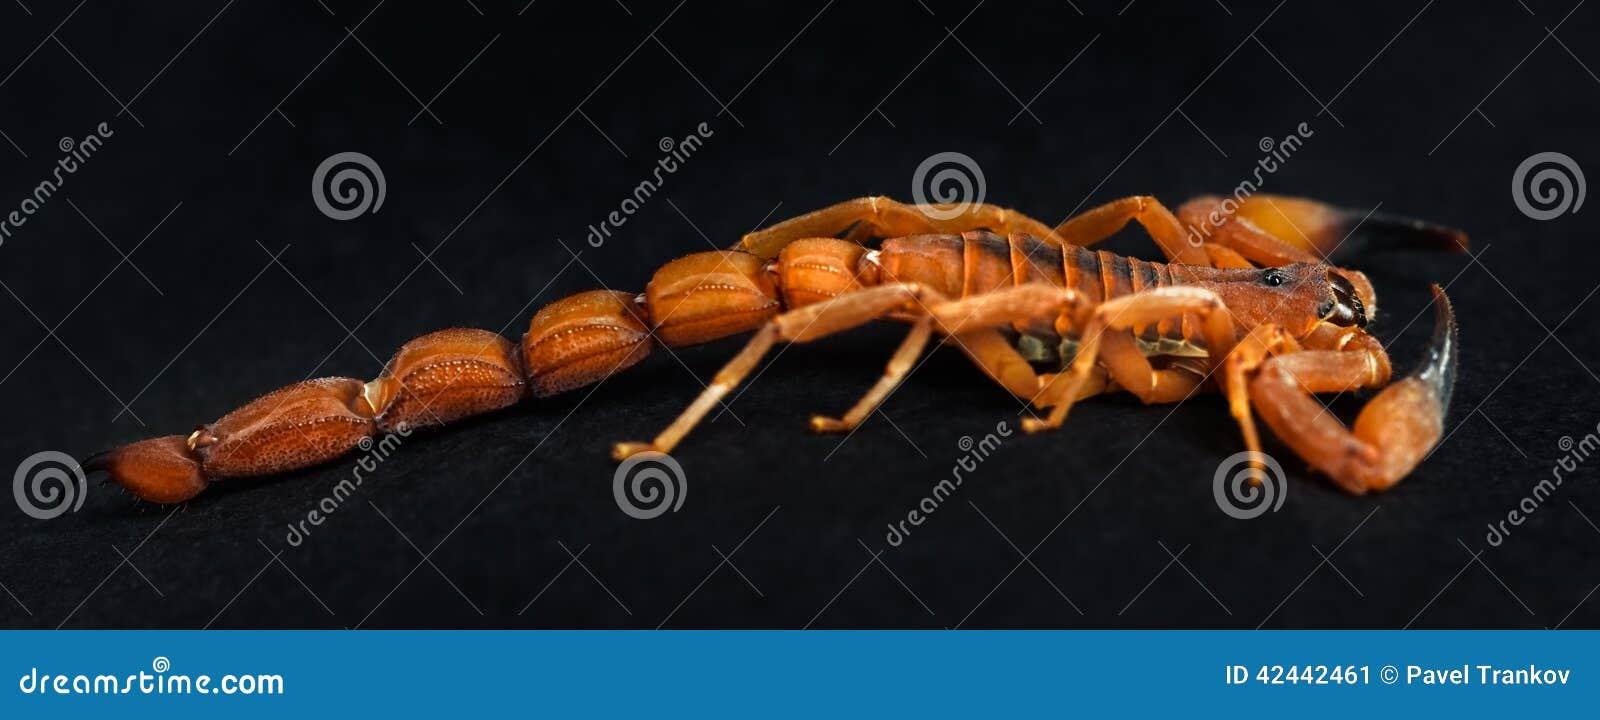 Rusty Thick Tail Scorpion